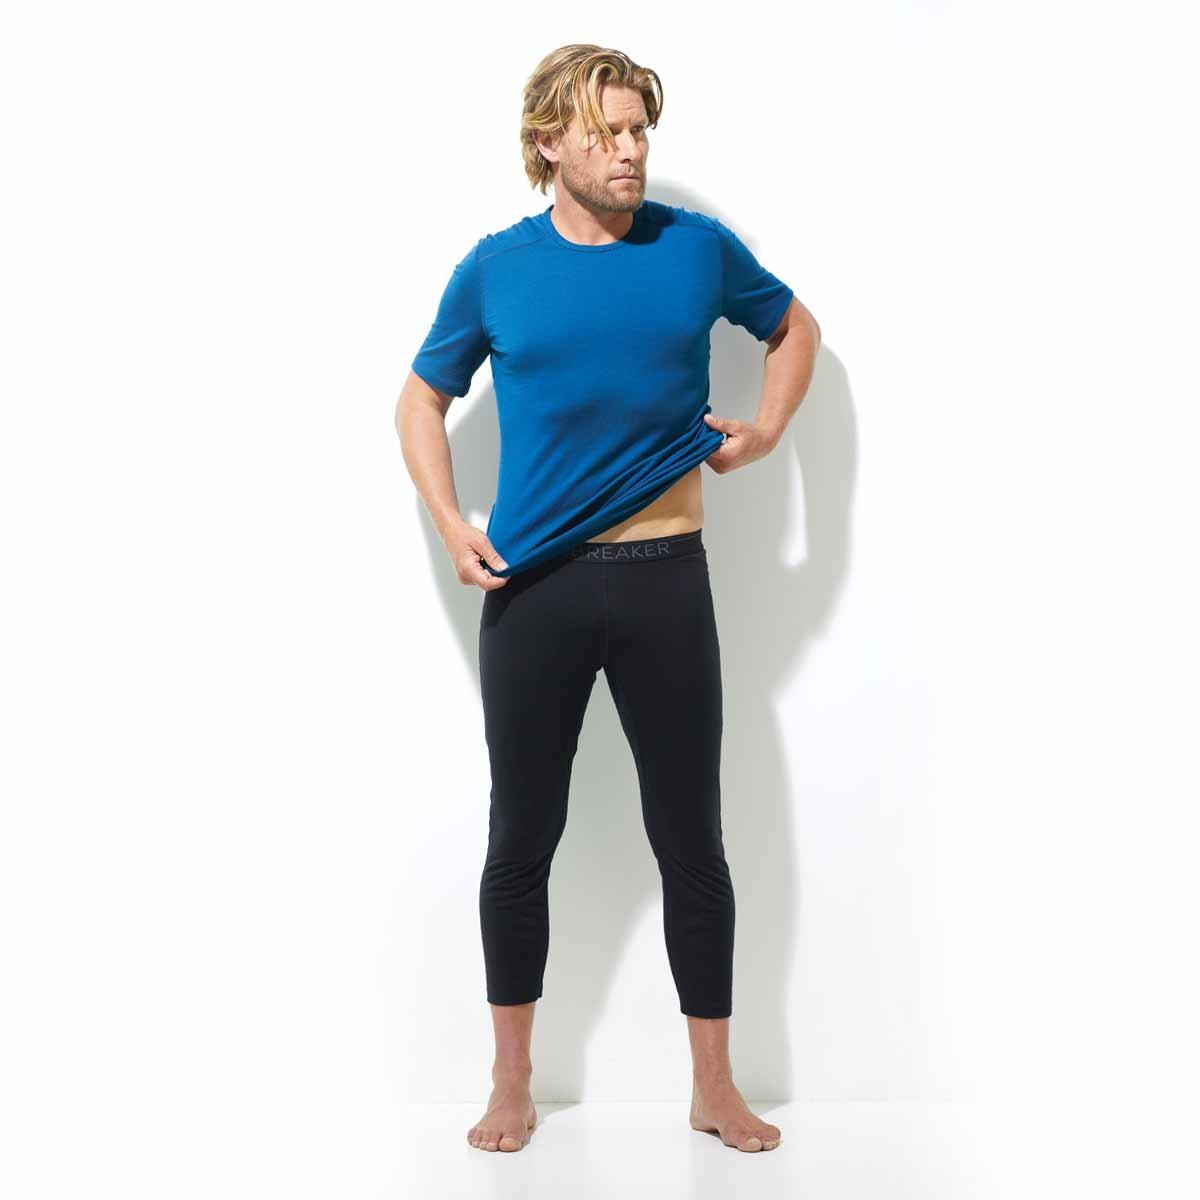 43e70319ce4 Icebreaker Merino Bodyfit 200 Oasis merino wol heren T-shirt